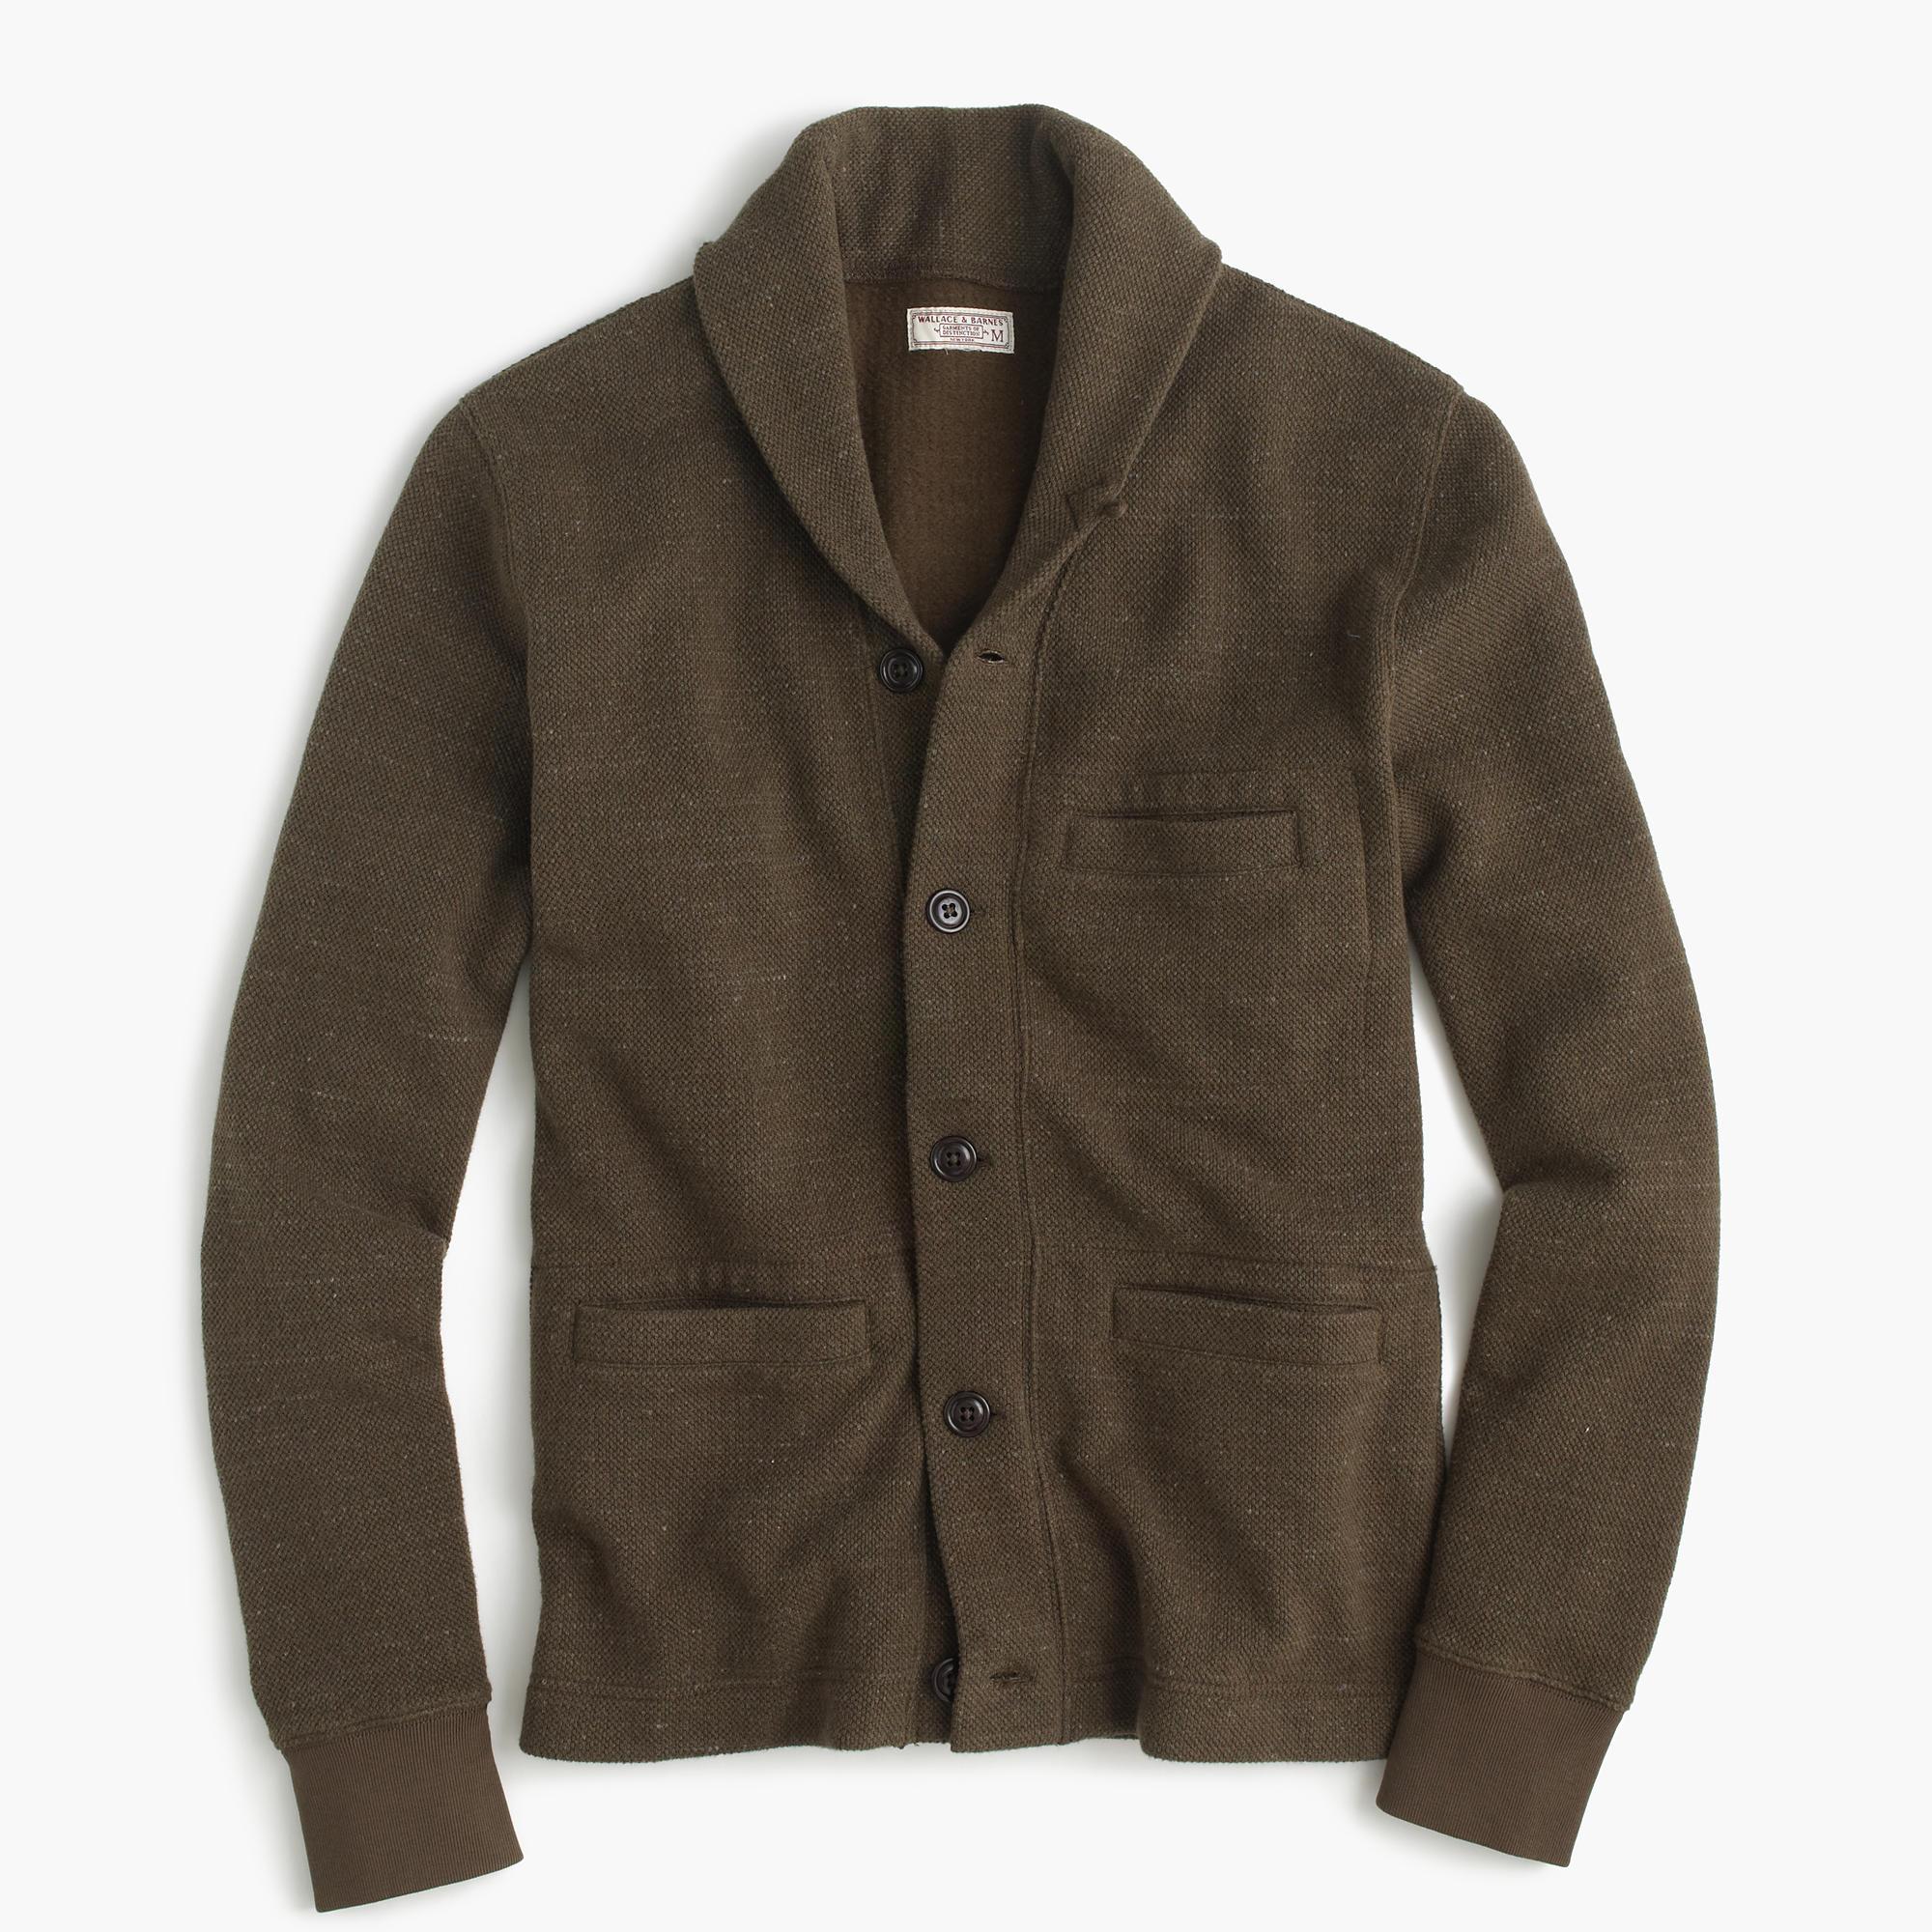 Wallace & Barnes Cotton Shawl-Collar Cardigan In Bird's